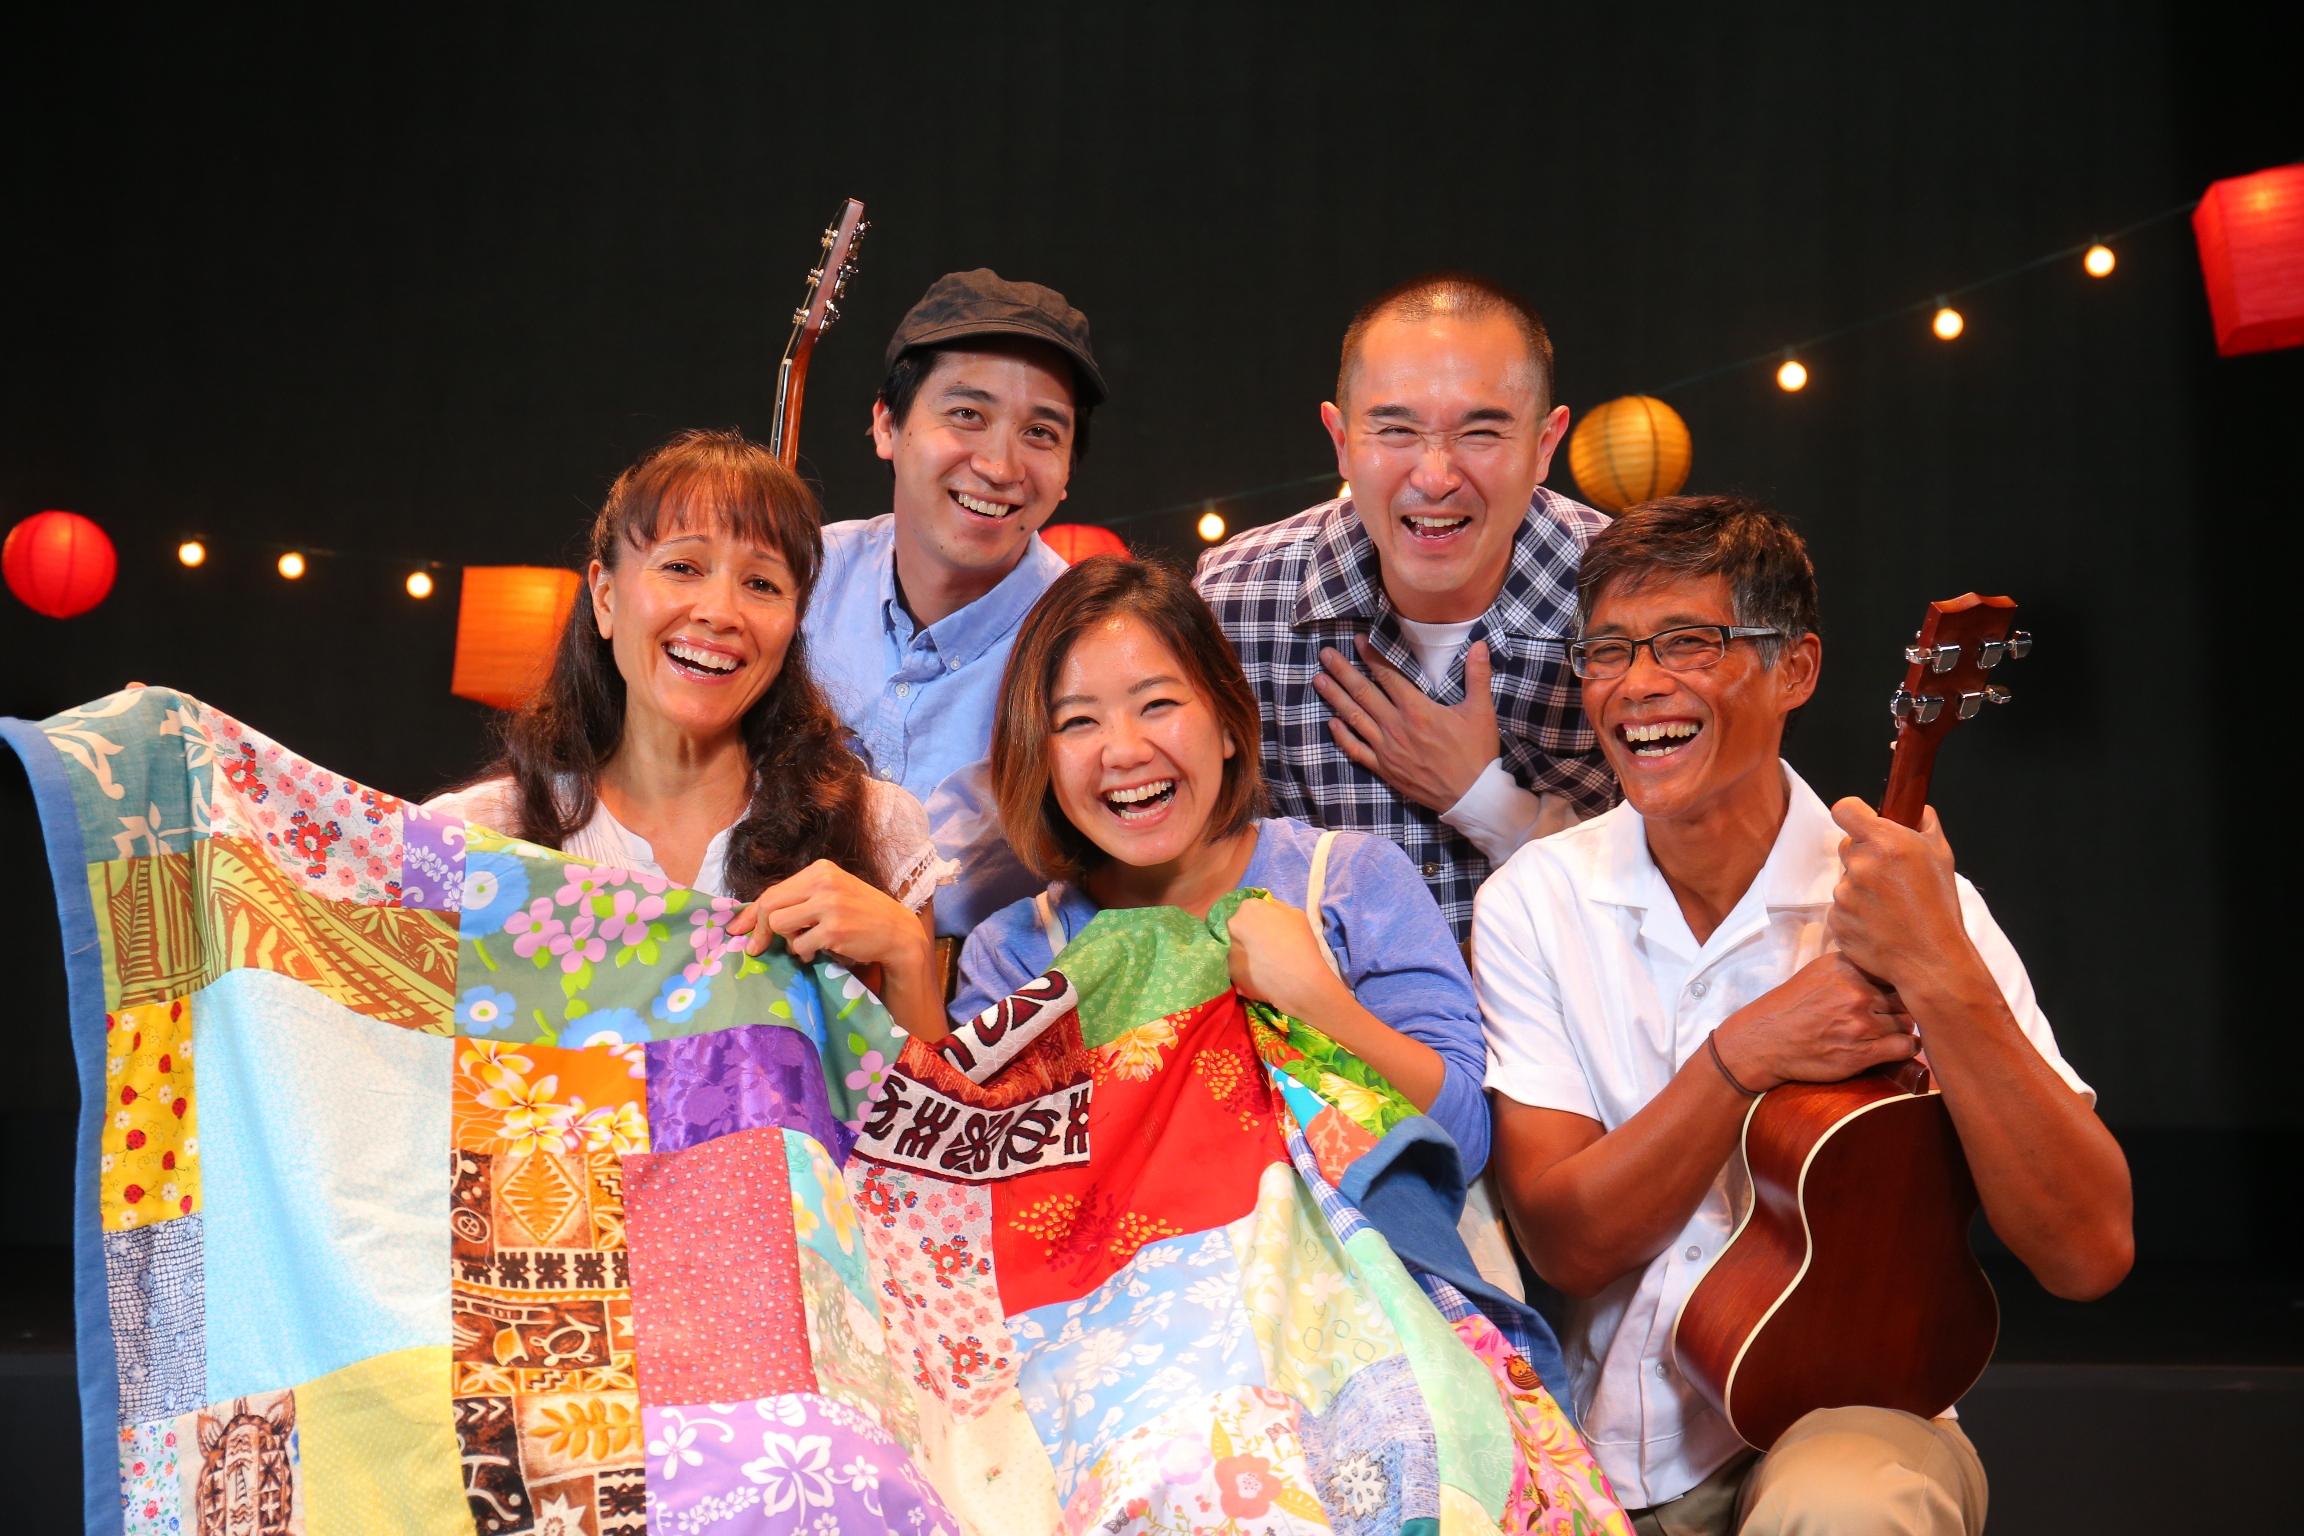 (T-B, L-R)   Sean-Joseph Choo, Alvin Chan, Maile Holck  , Christina Uyeno, Junior Tesoro. Photo credit Brad Goda.